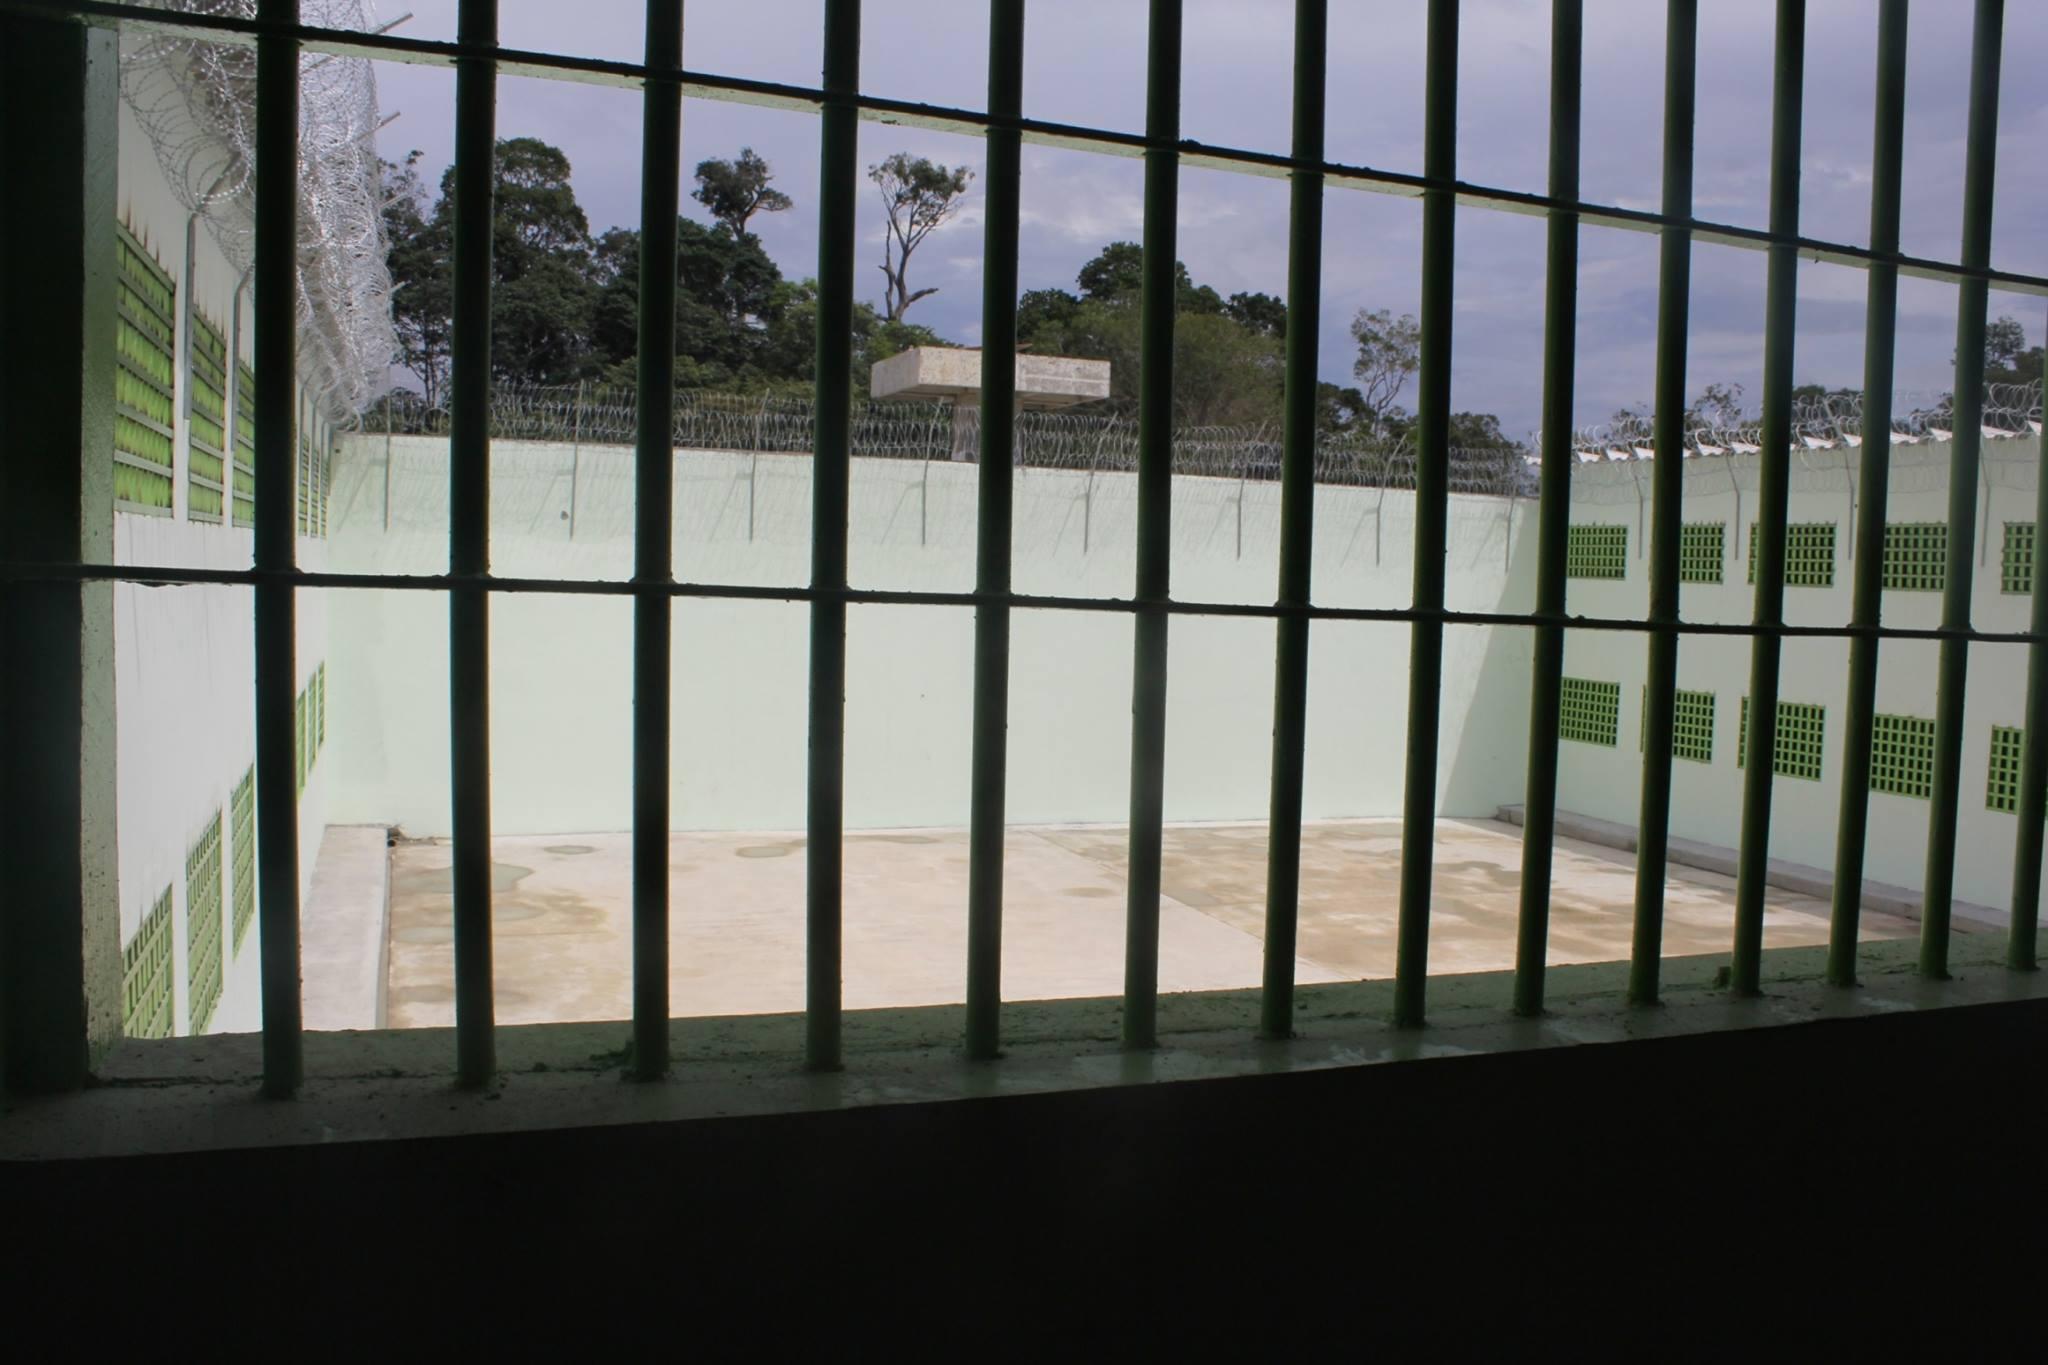 Prison in Amazonas (Photo: SEAP Amazonas Social media)